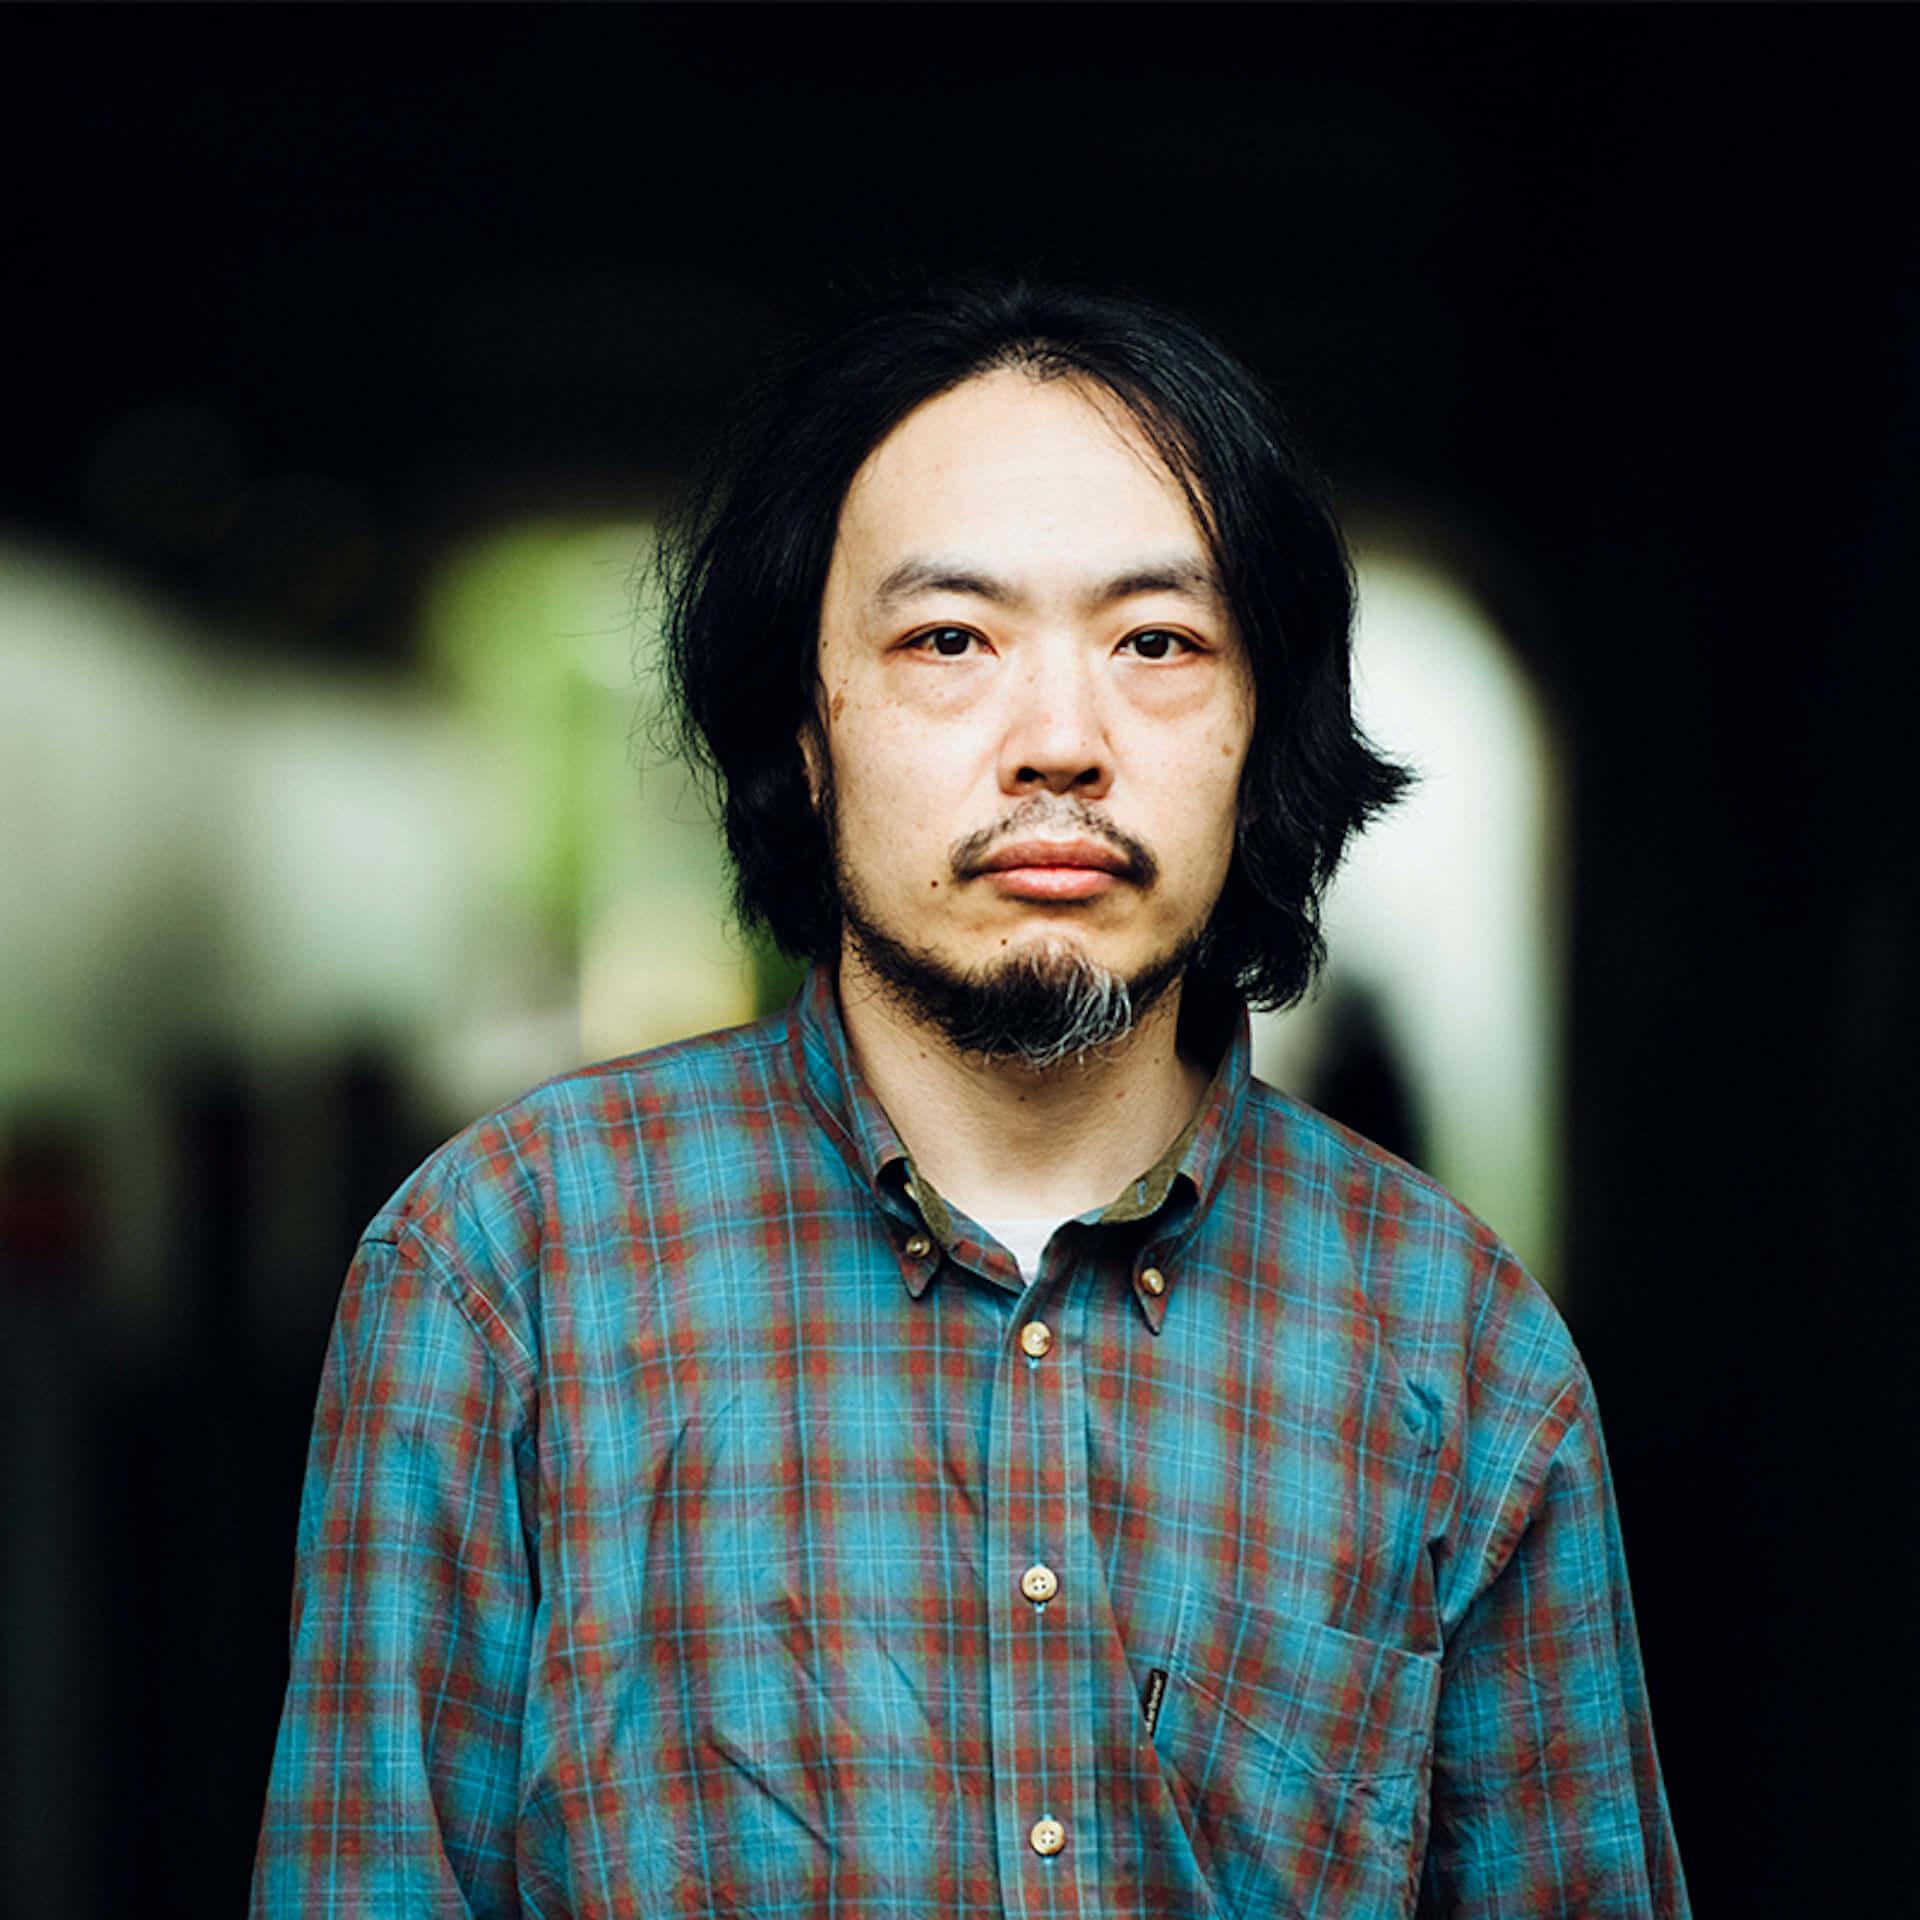 Gonno×Masumura、YPY×山本達久のコラボライブなど盛り沢山!渋谷Contactにて年末の祝祭<KALMANEIT>が開催決定 music201208_contact_1-1920x1920